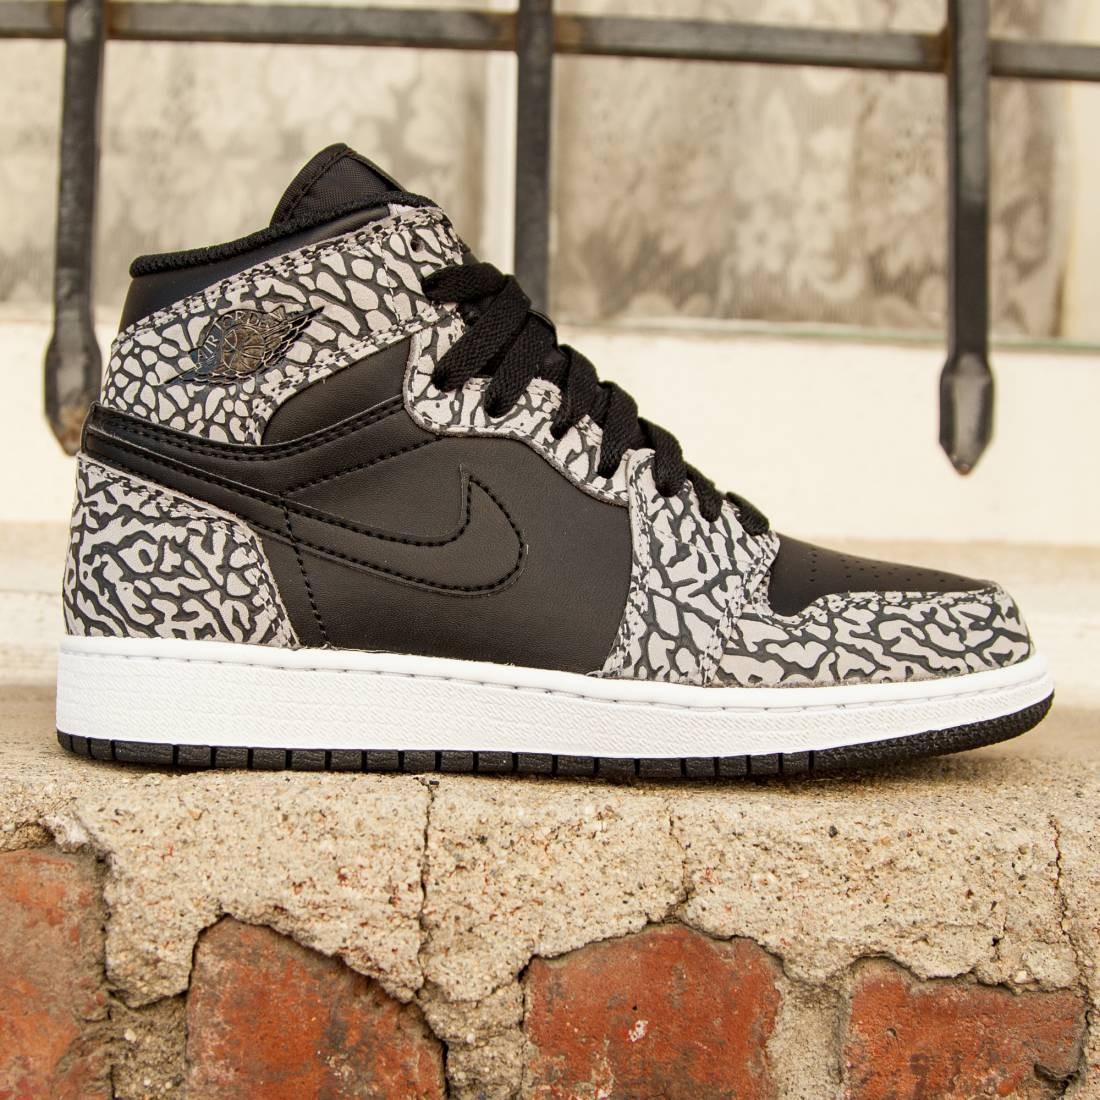 fdc4fa494ab Air Jordan 1 Retro High Prem BP Little Kids (black   cement grey    anthracite   gym red)